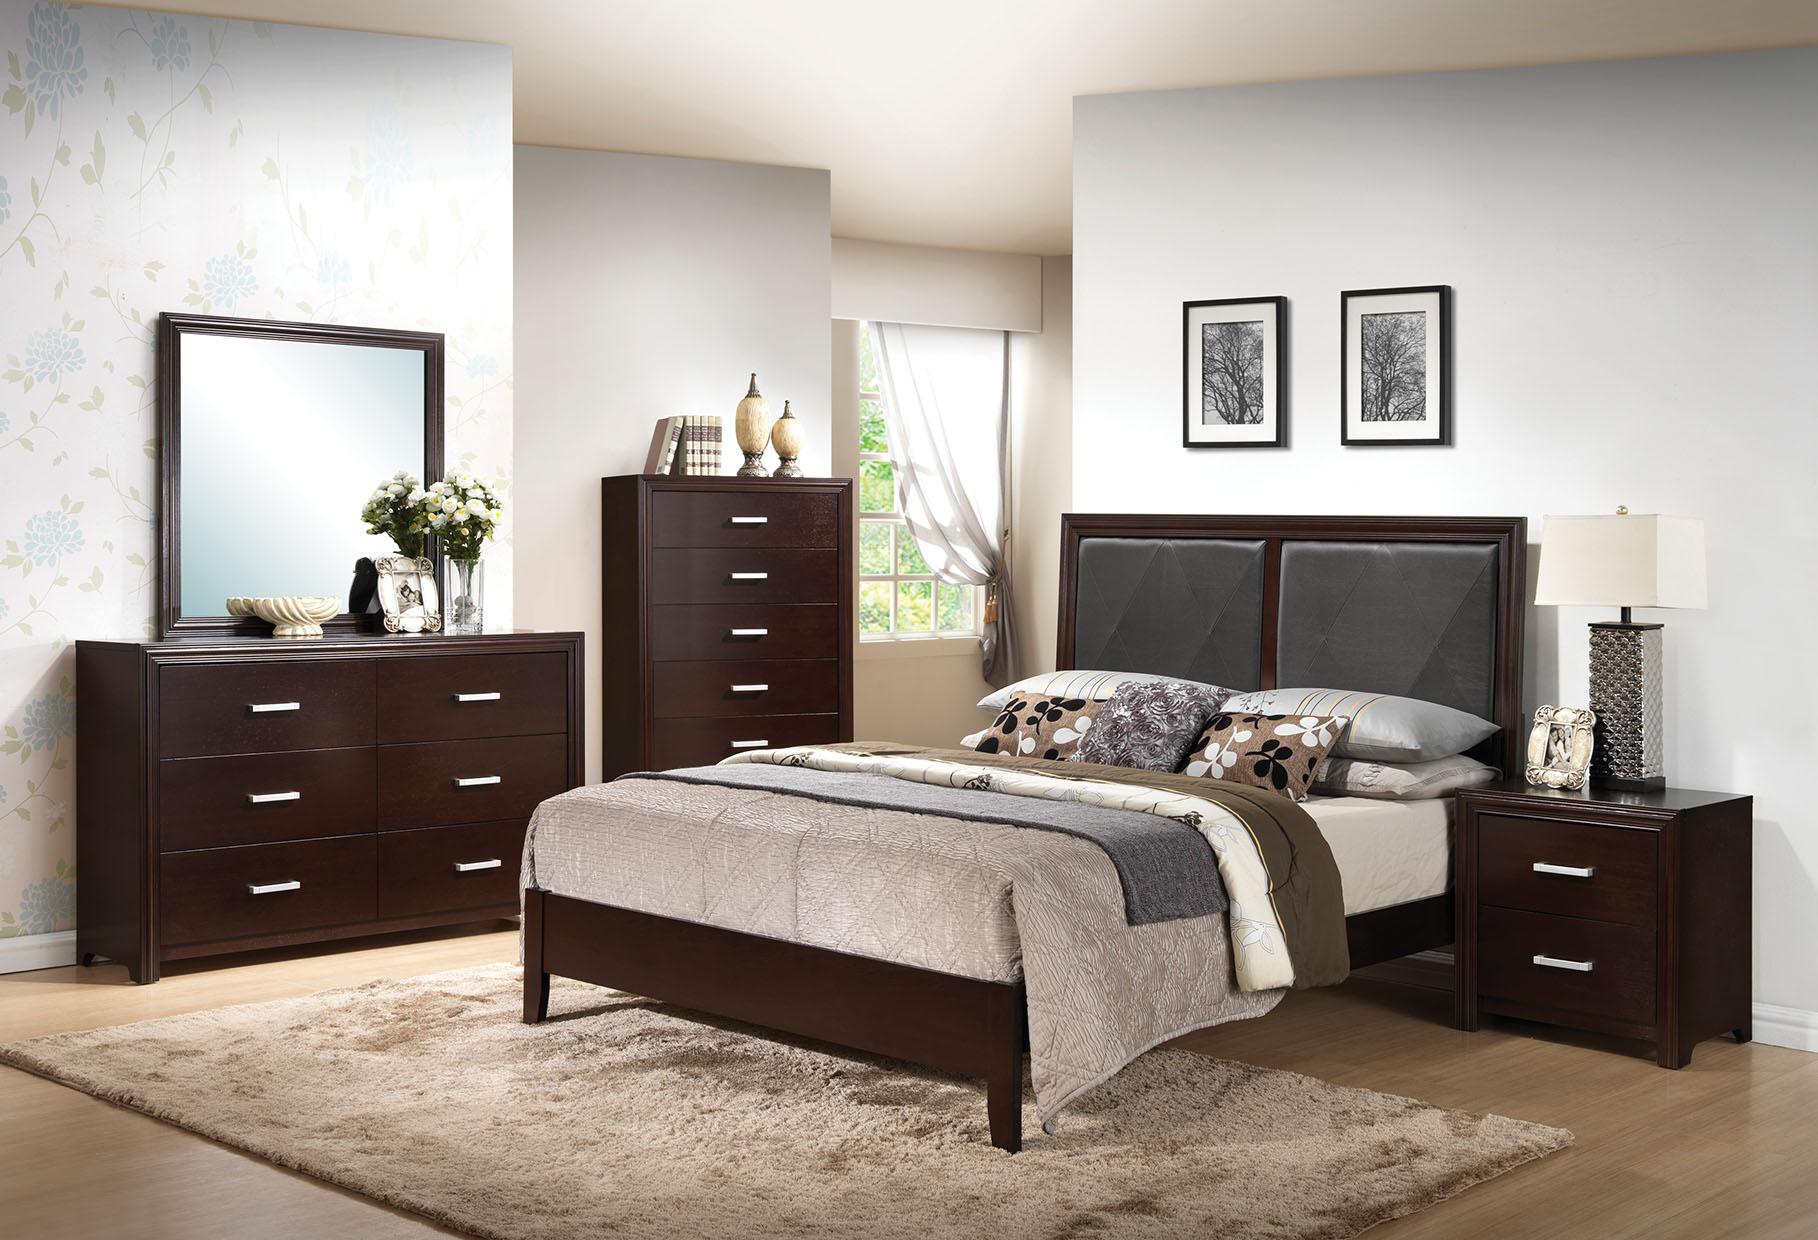 Silver Bedroom Furniture. Second-sun.co